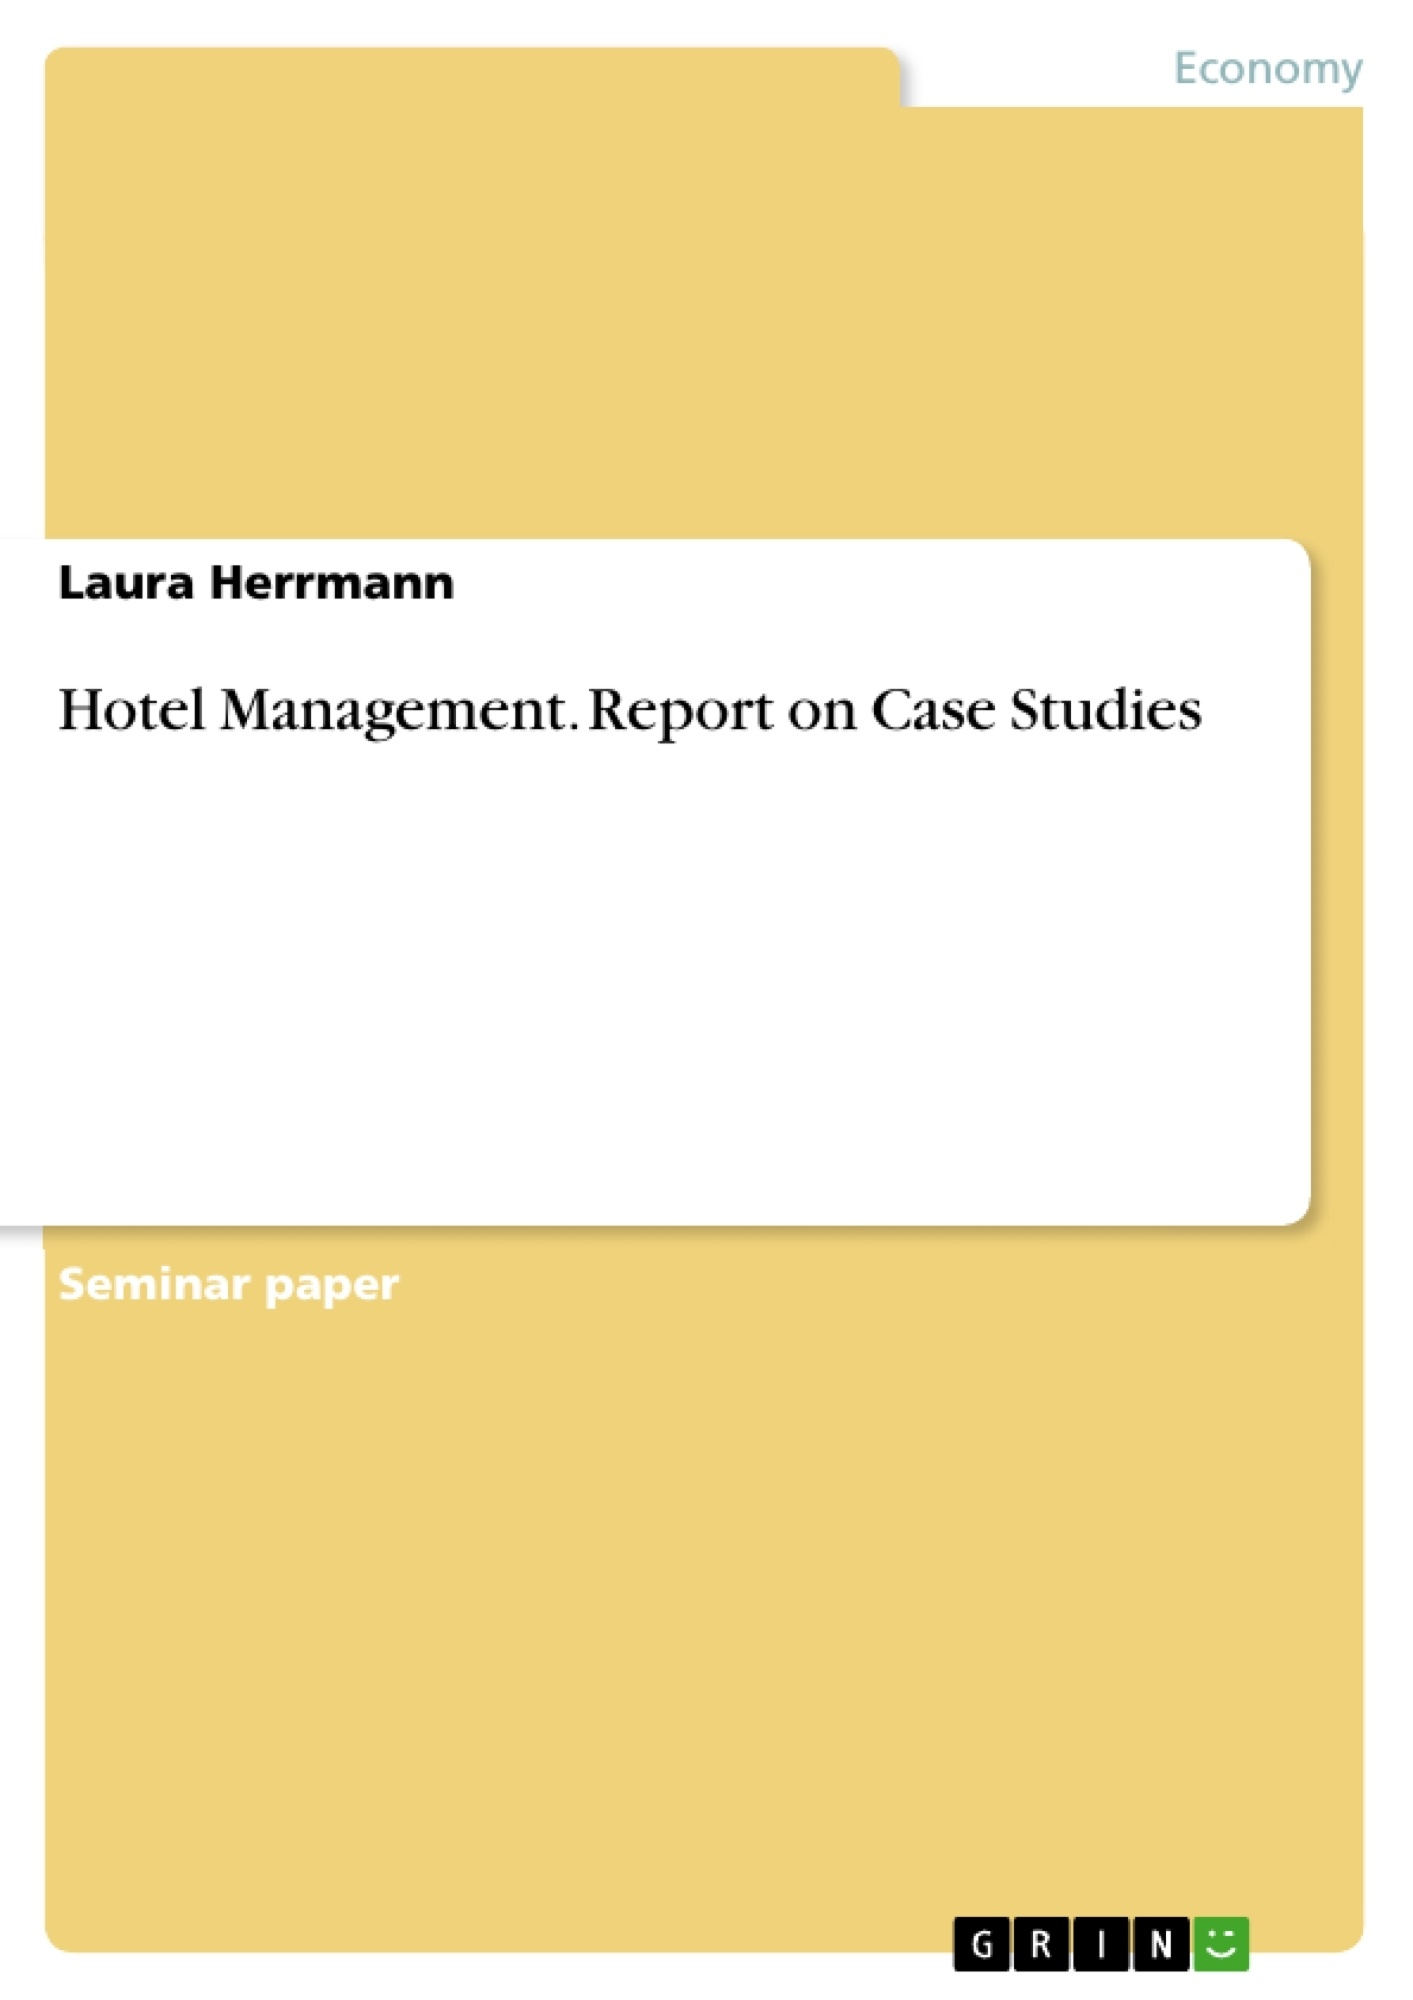 Title: Hotel Management. Report on Case Studies